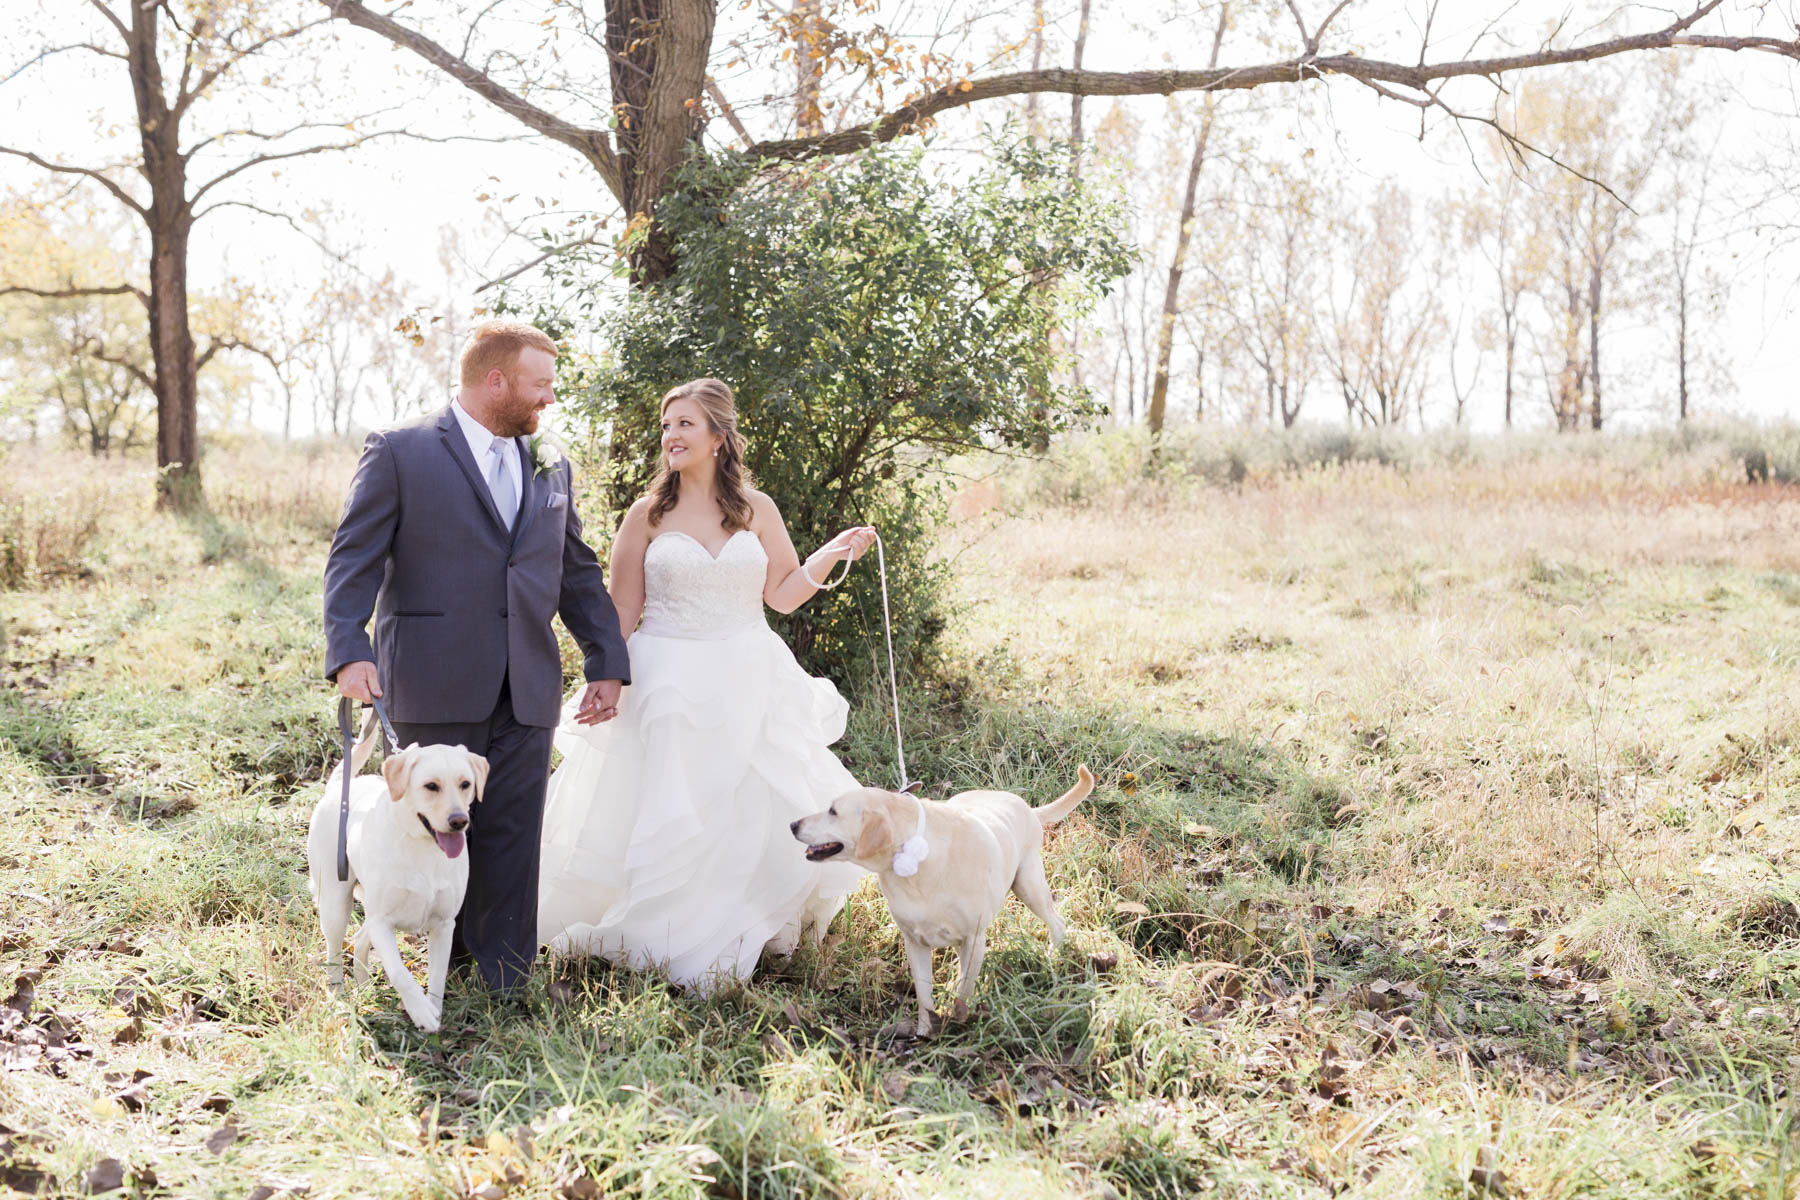 shotbychelsea_blog_wedding-18.jpg